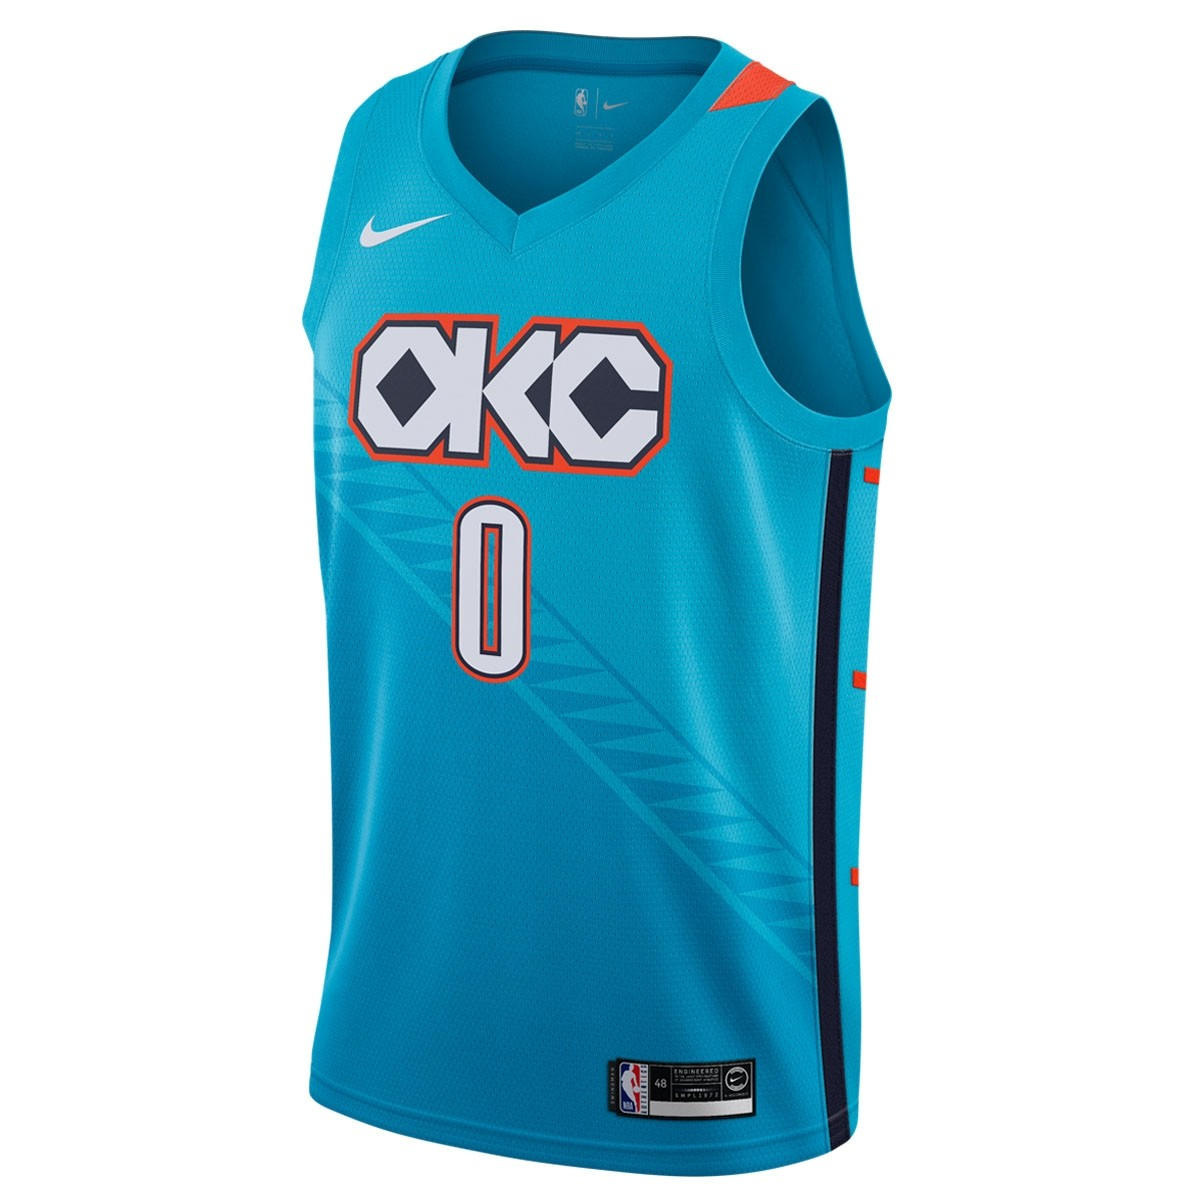 Nike NBA OKC Swingman Jersey Westbrook 'City Edition'